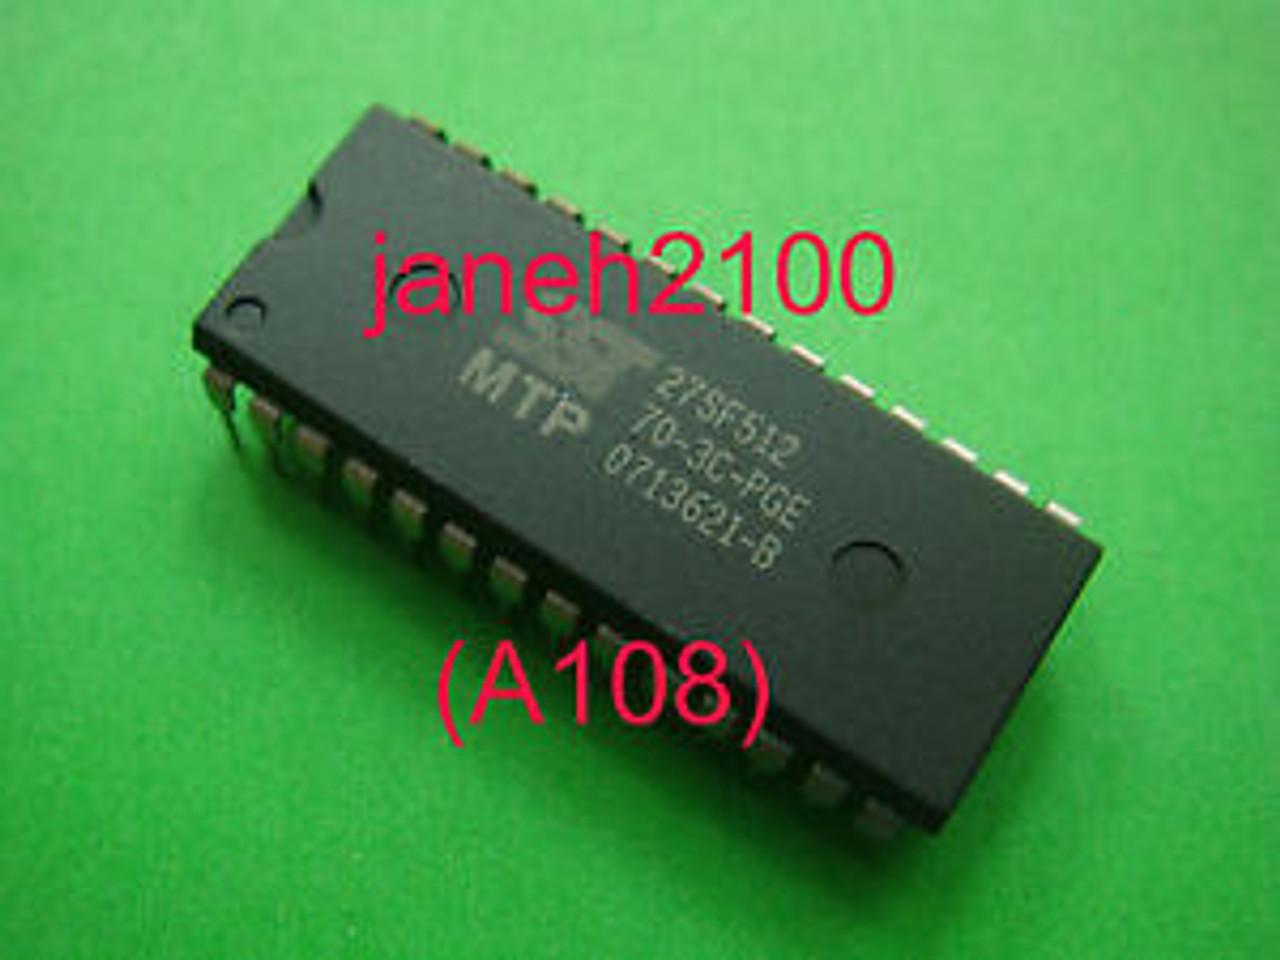 A108 1p SST 27SF512-70-3C-PG 27SF512-70-3C-PGE SST 27SF512 DIP-28 IC